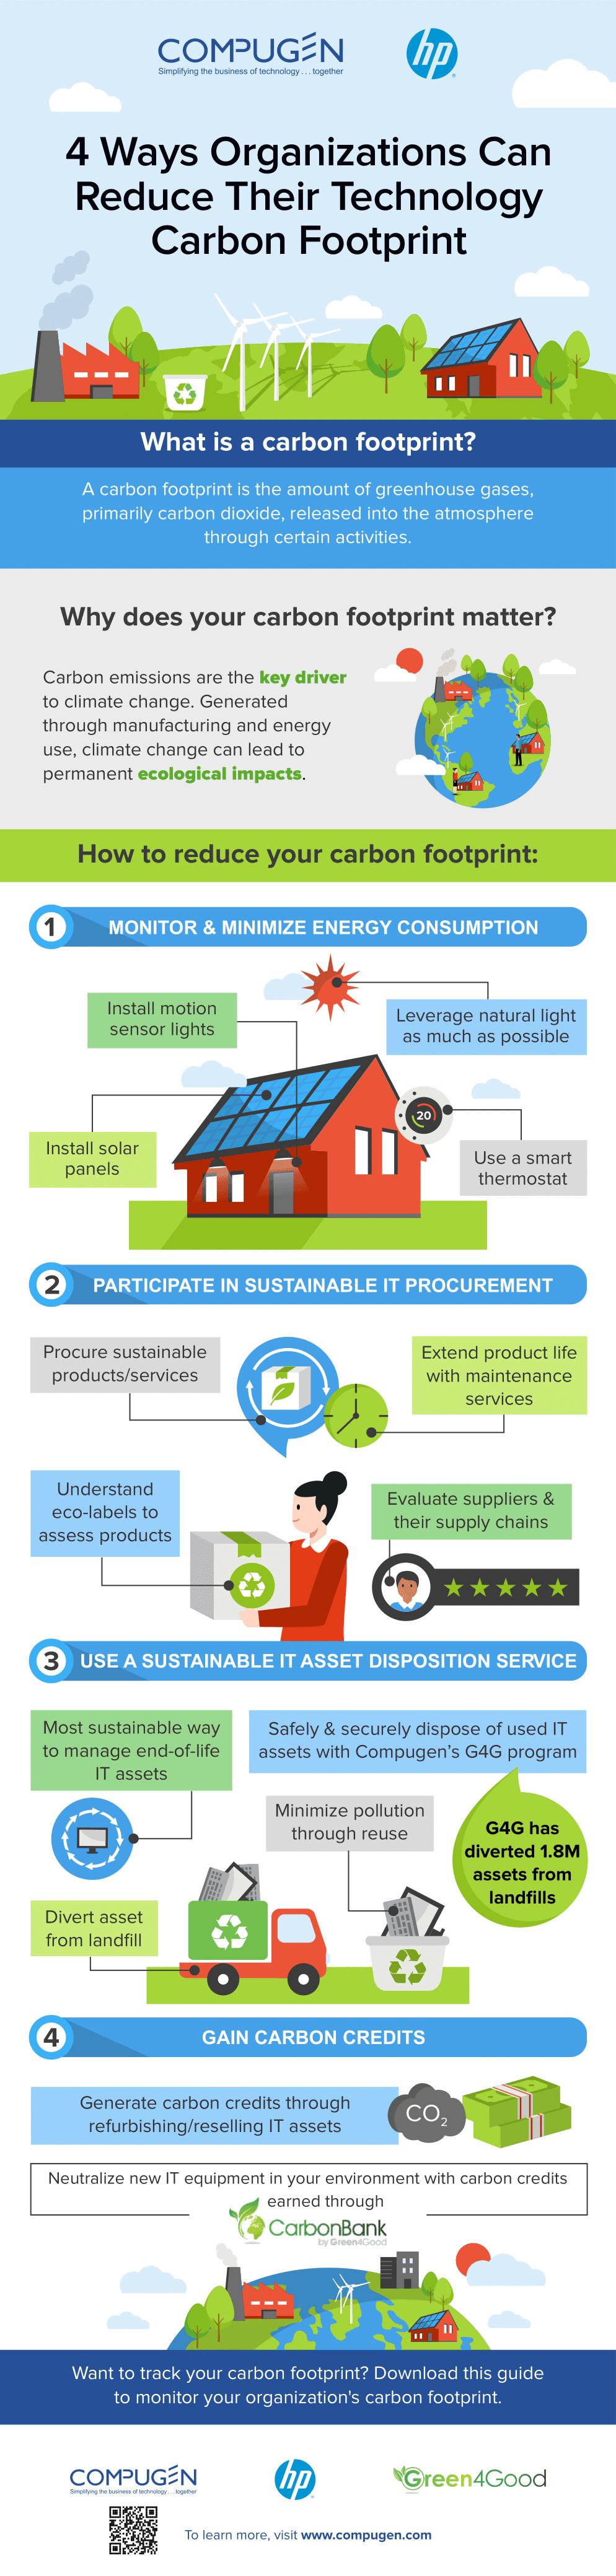 4 ways organizations can reduce their carbon footprint IG full draft 1